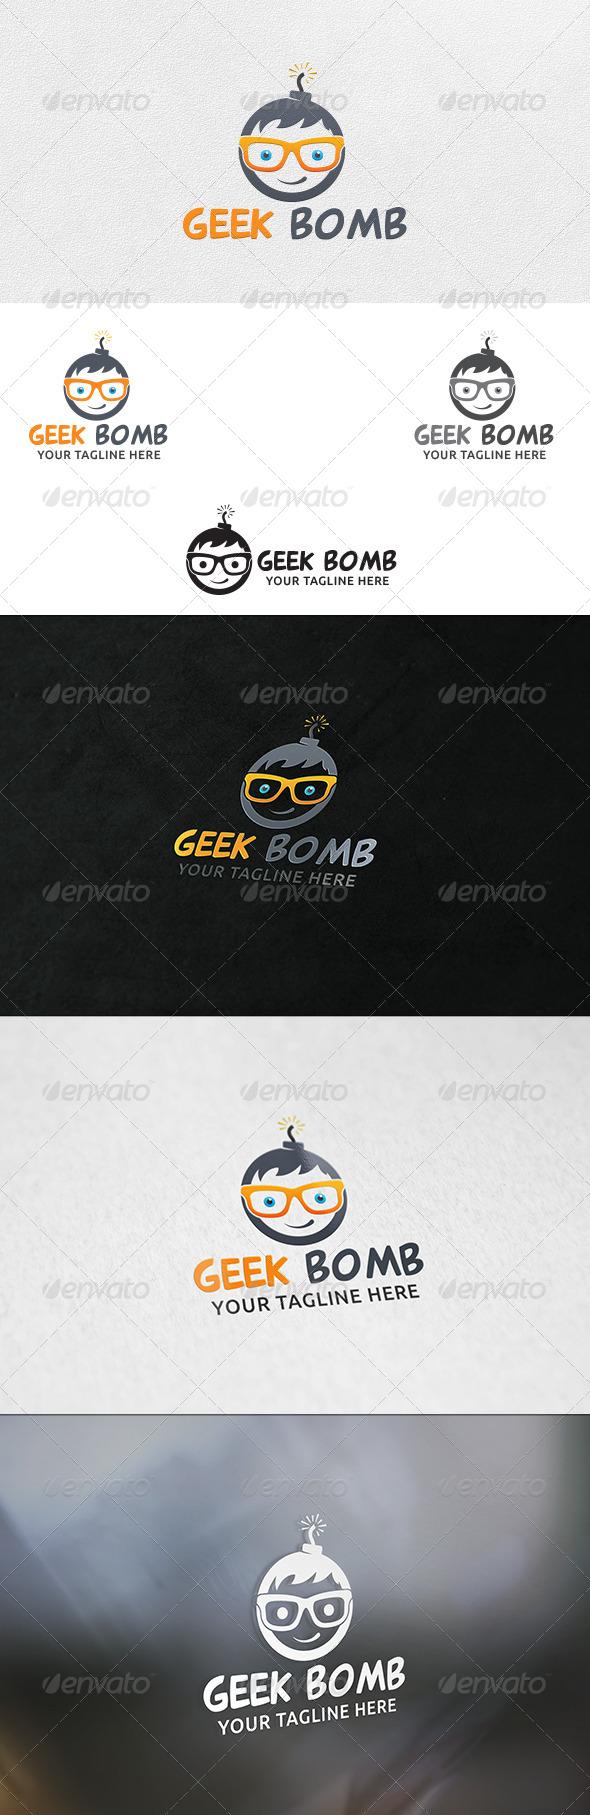 GraphicRiver Geek Bomb V2 Logo Template 6506727